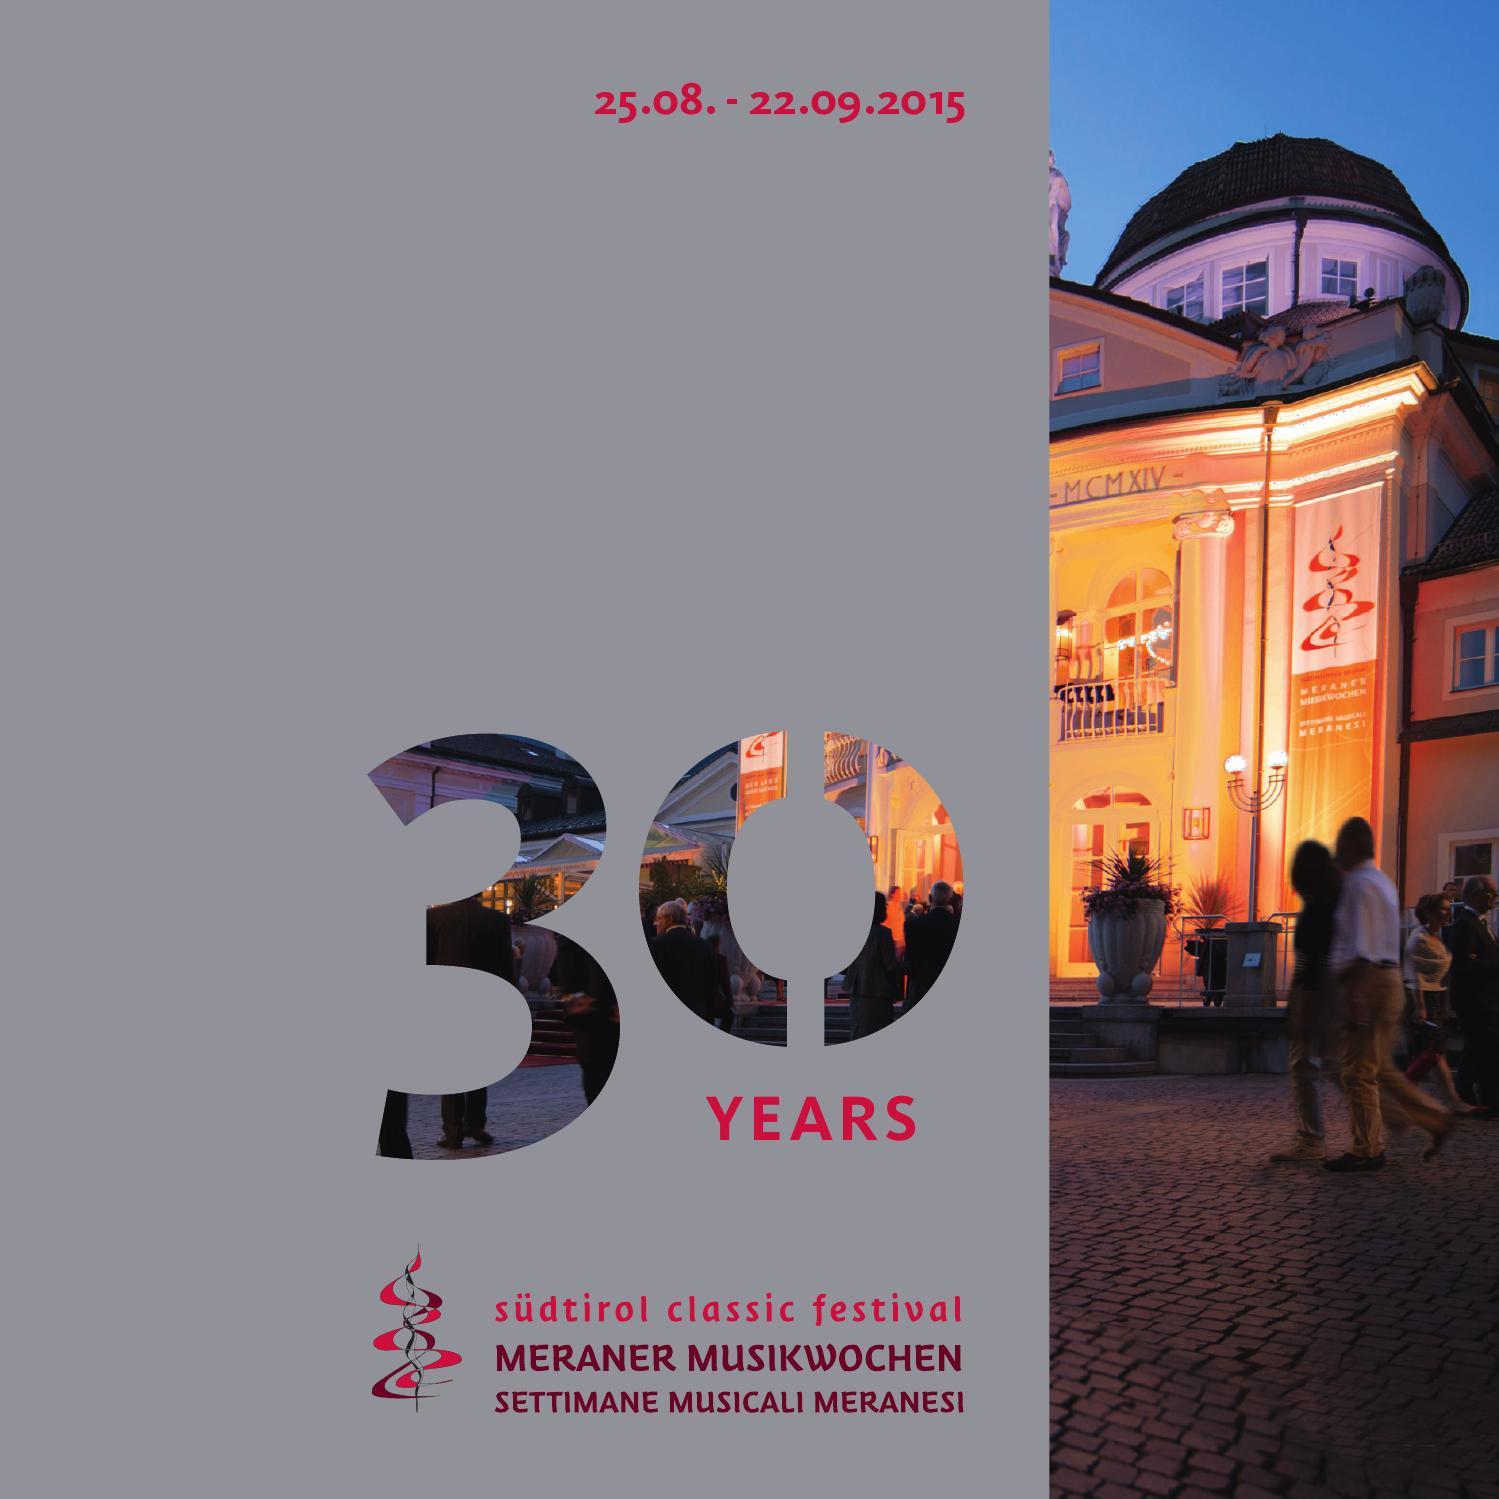 Meraner musikwochen 2015 by stingel grafik issuu for Azienda soggiorno merano